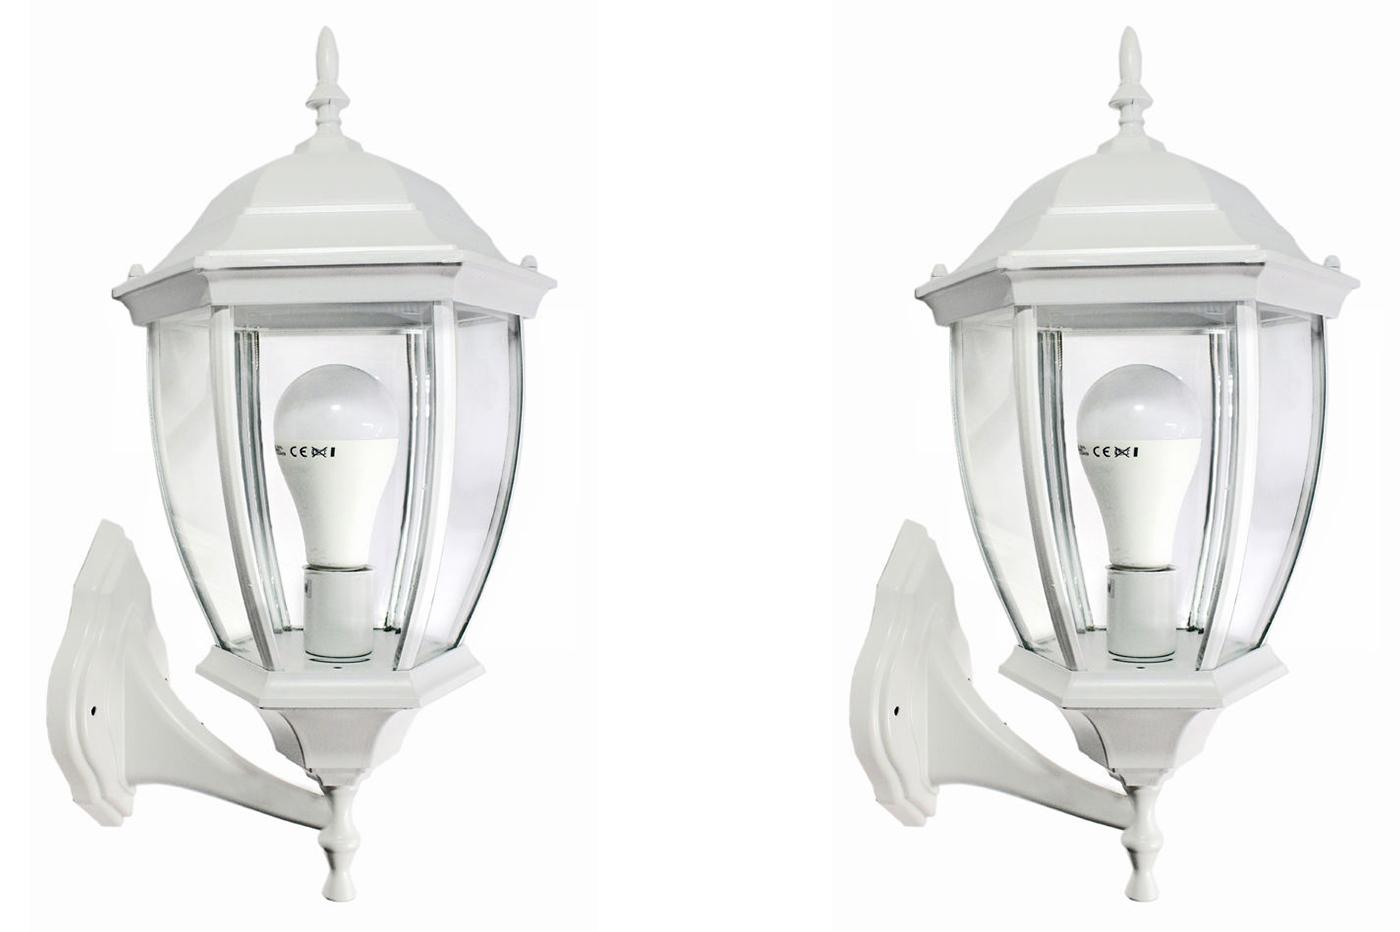 Applique lampada lanterna vintage parete ip esterno w bianco